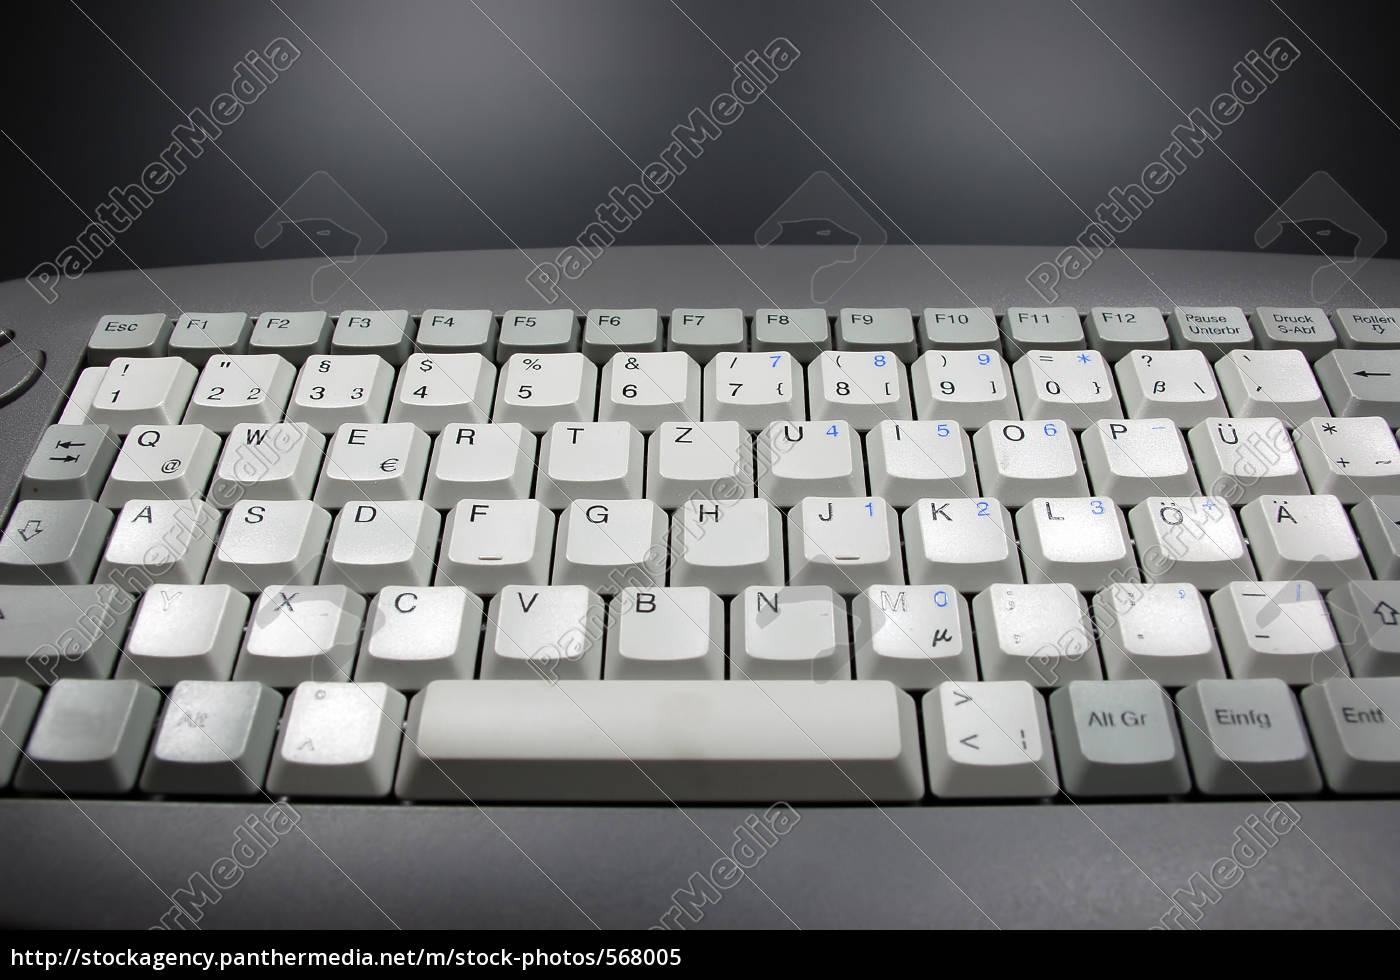 keyboard - 568005